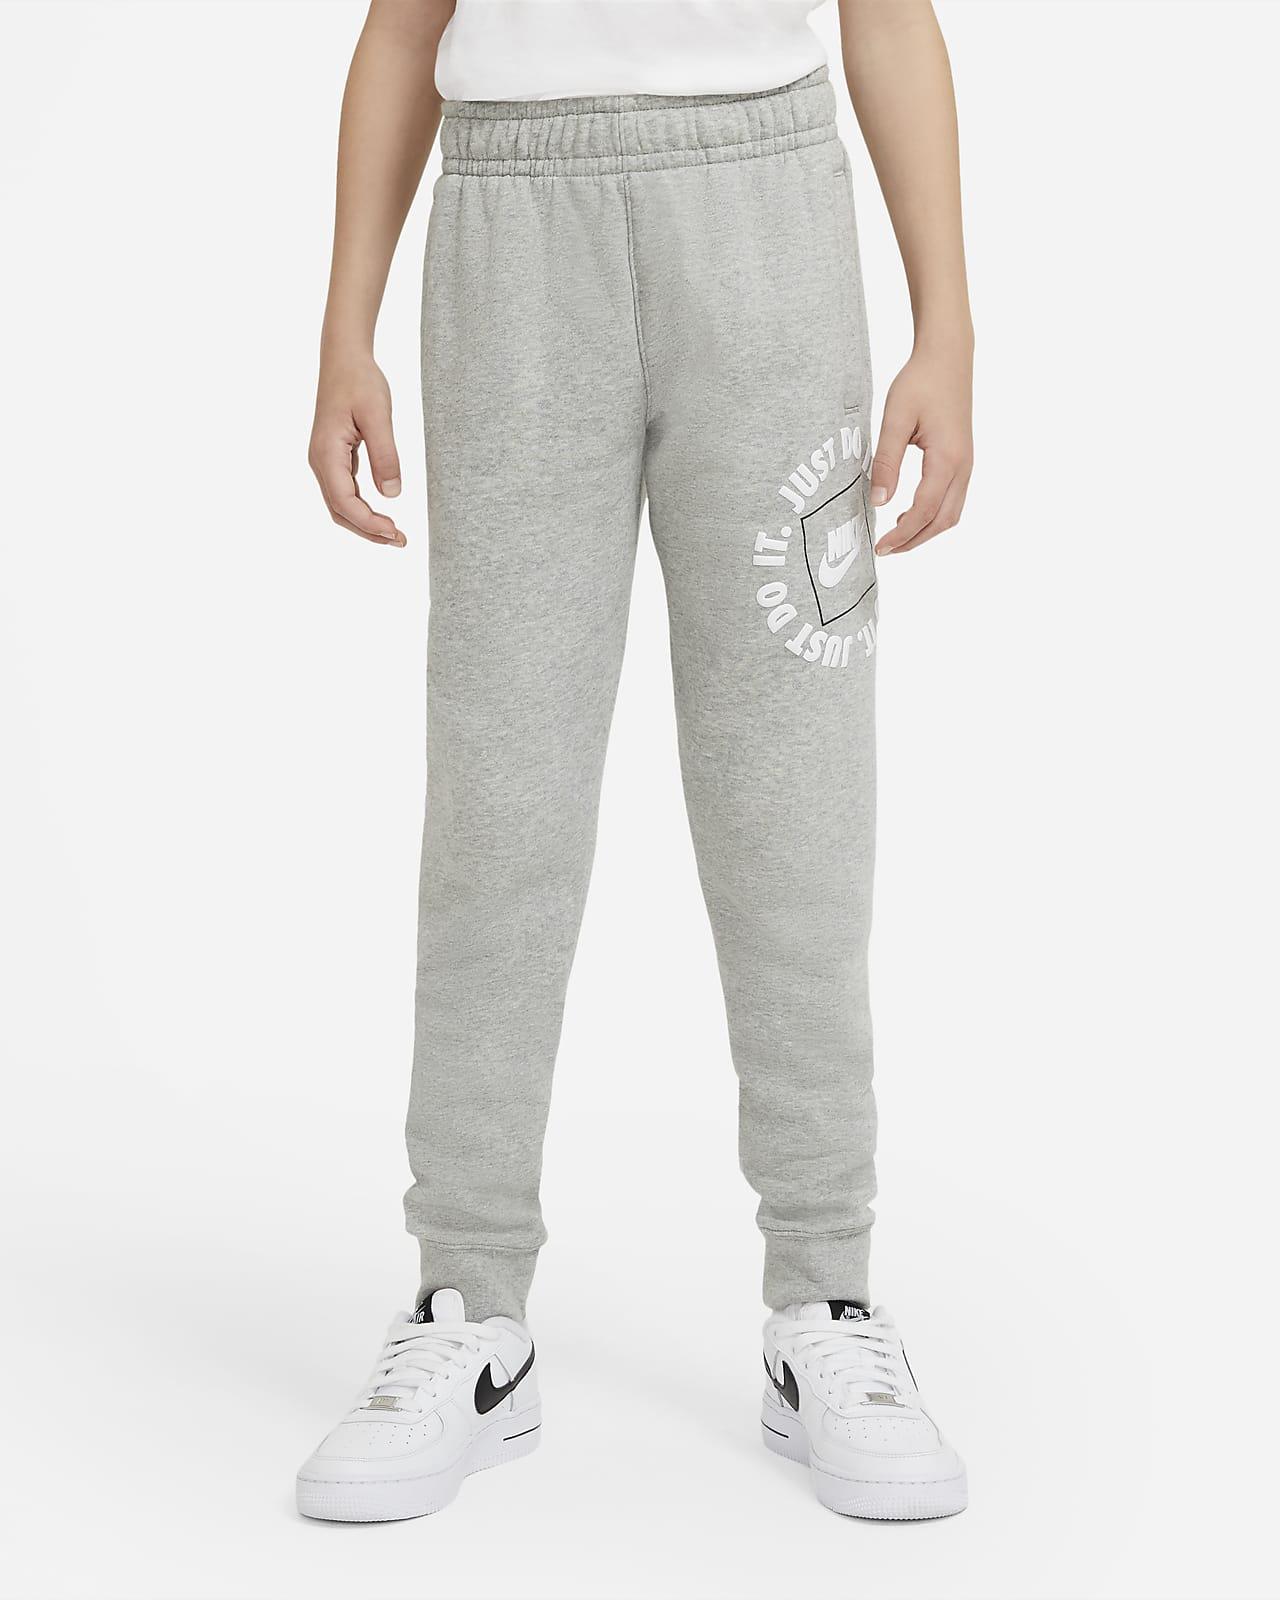 Pantaloni Nike Sportswear JDI - Ragazzo